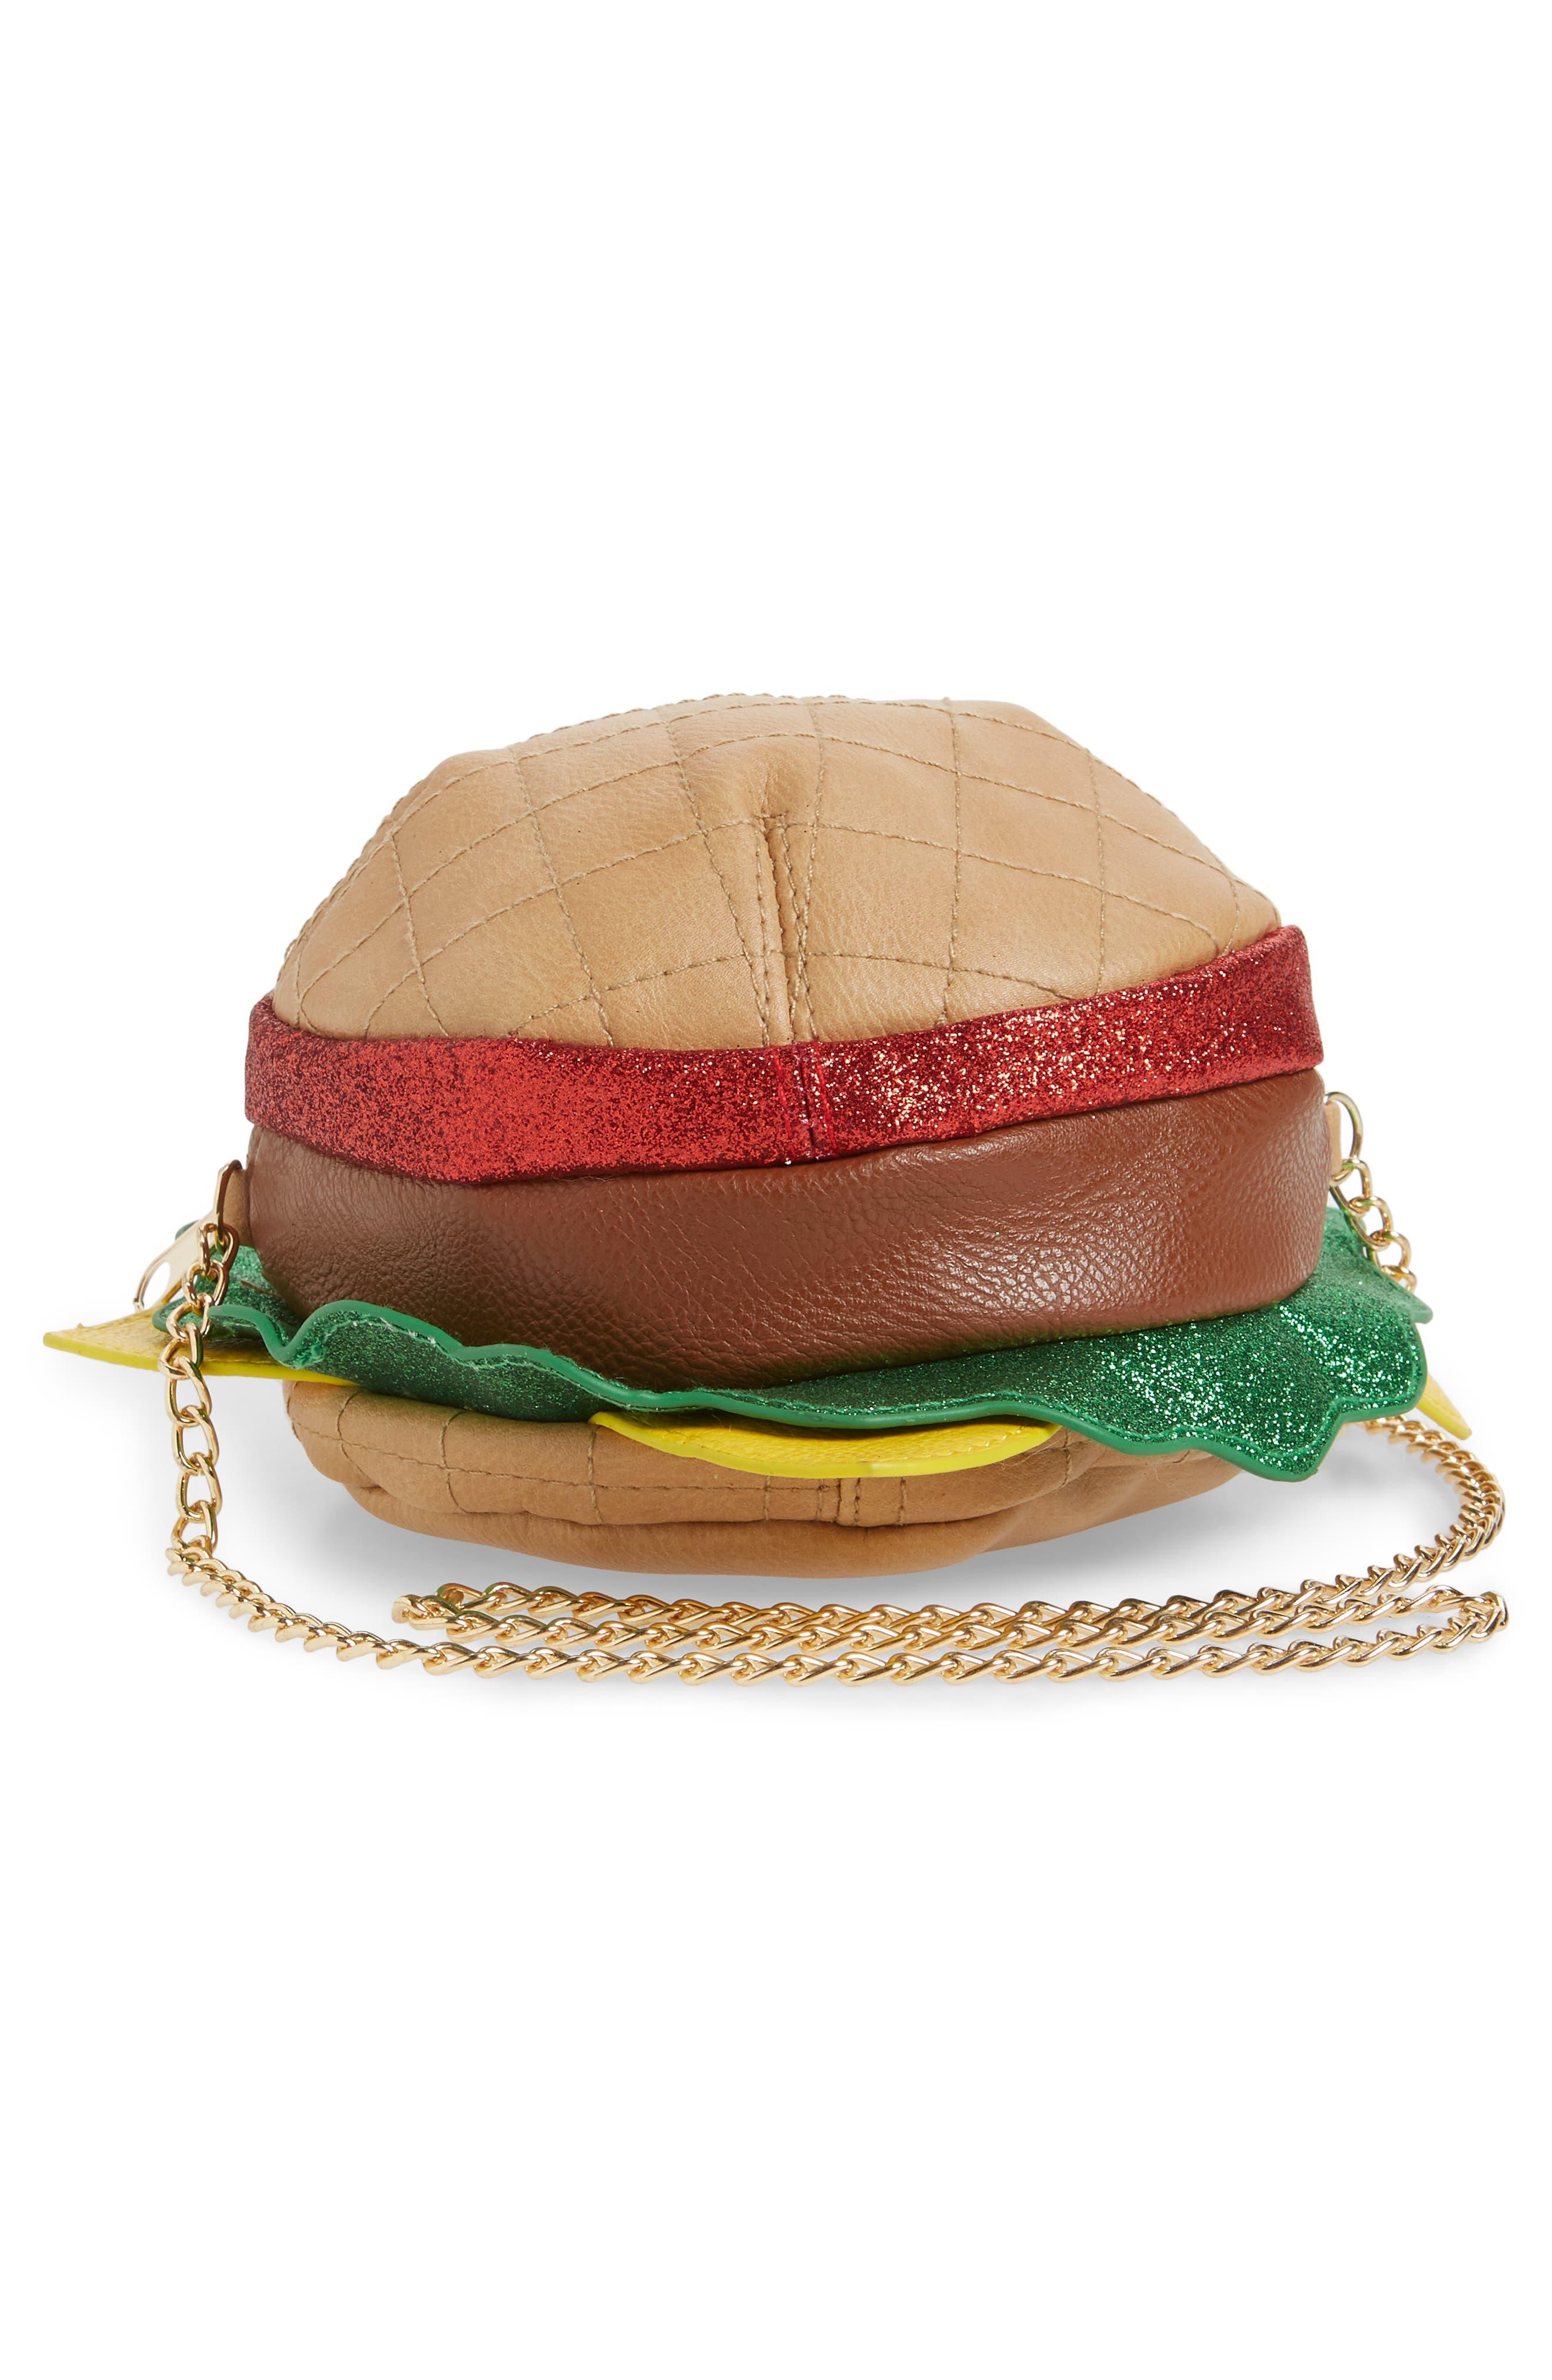 Hamburger Crossbody Bag,                             Alternate thumbnail 3, color,                             Multi Combo